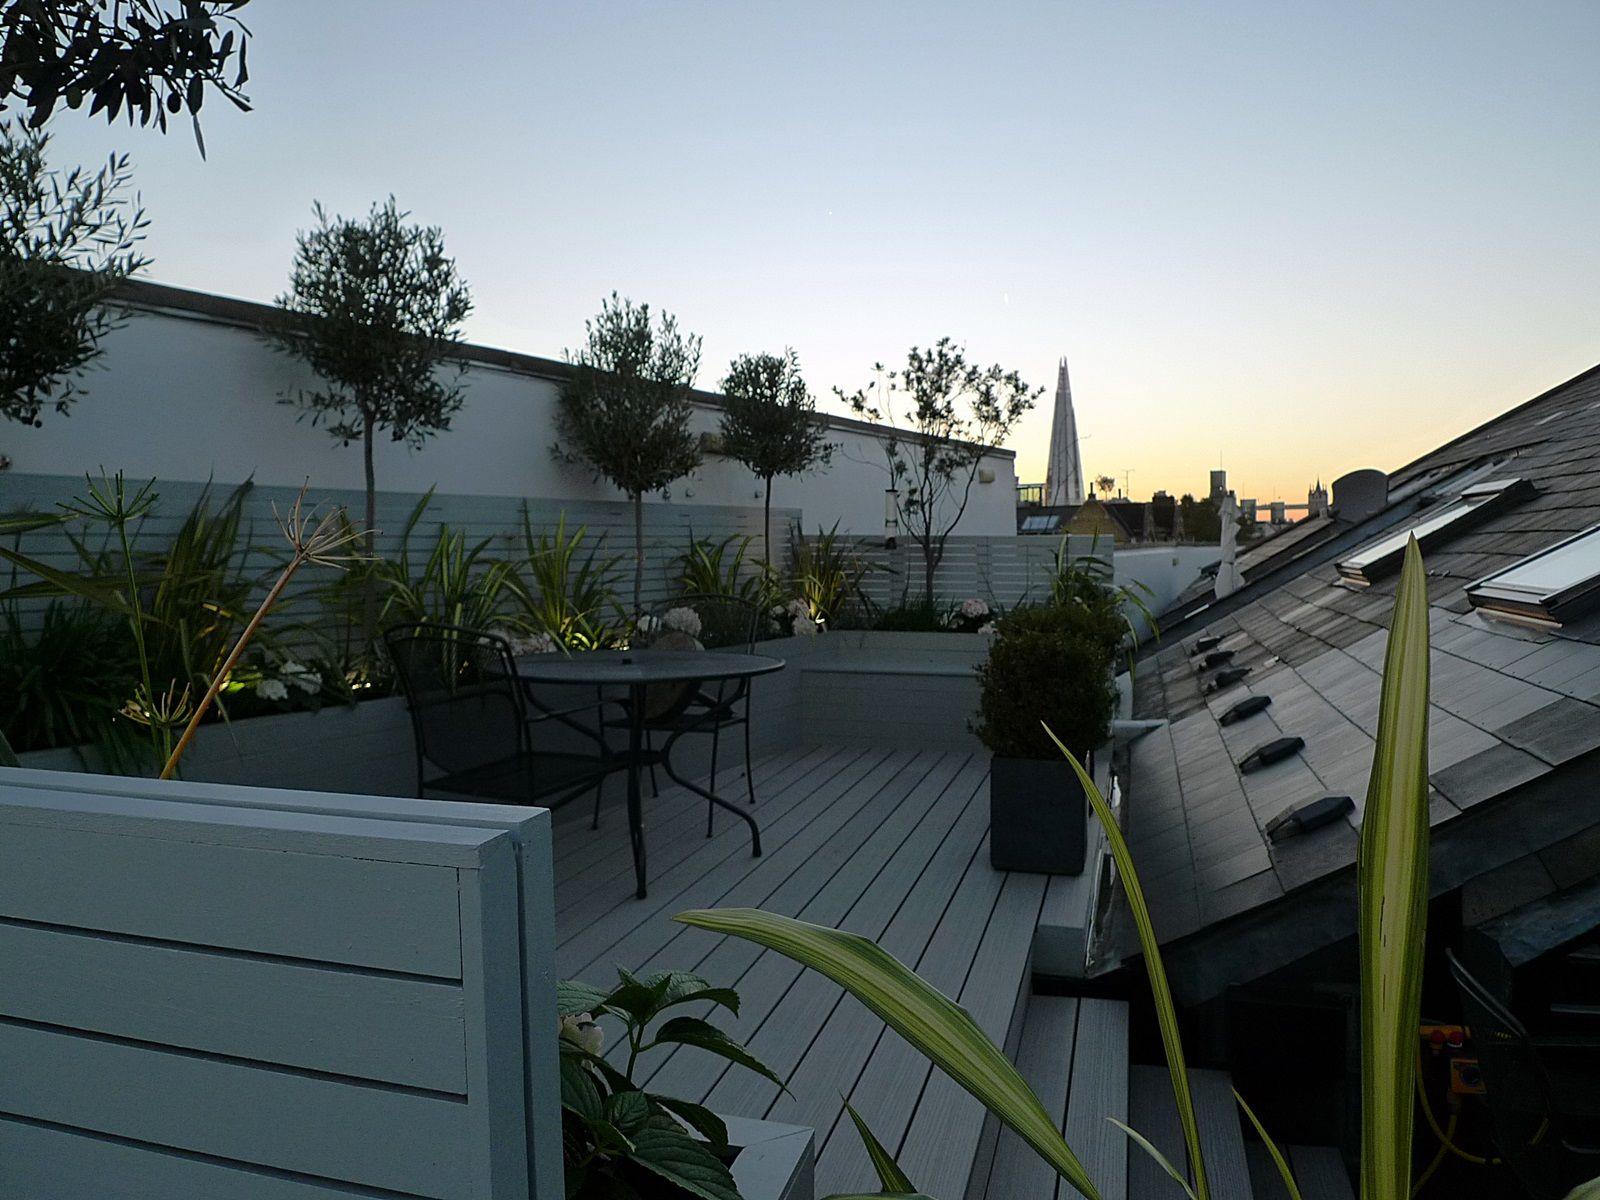 Painted Trellis Ideas Part - 34: Hardwood Screen Trellis Horizontal Slats Painted Grey Raised Beds Composite  Grey Decking Roof Terrace Garden Design